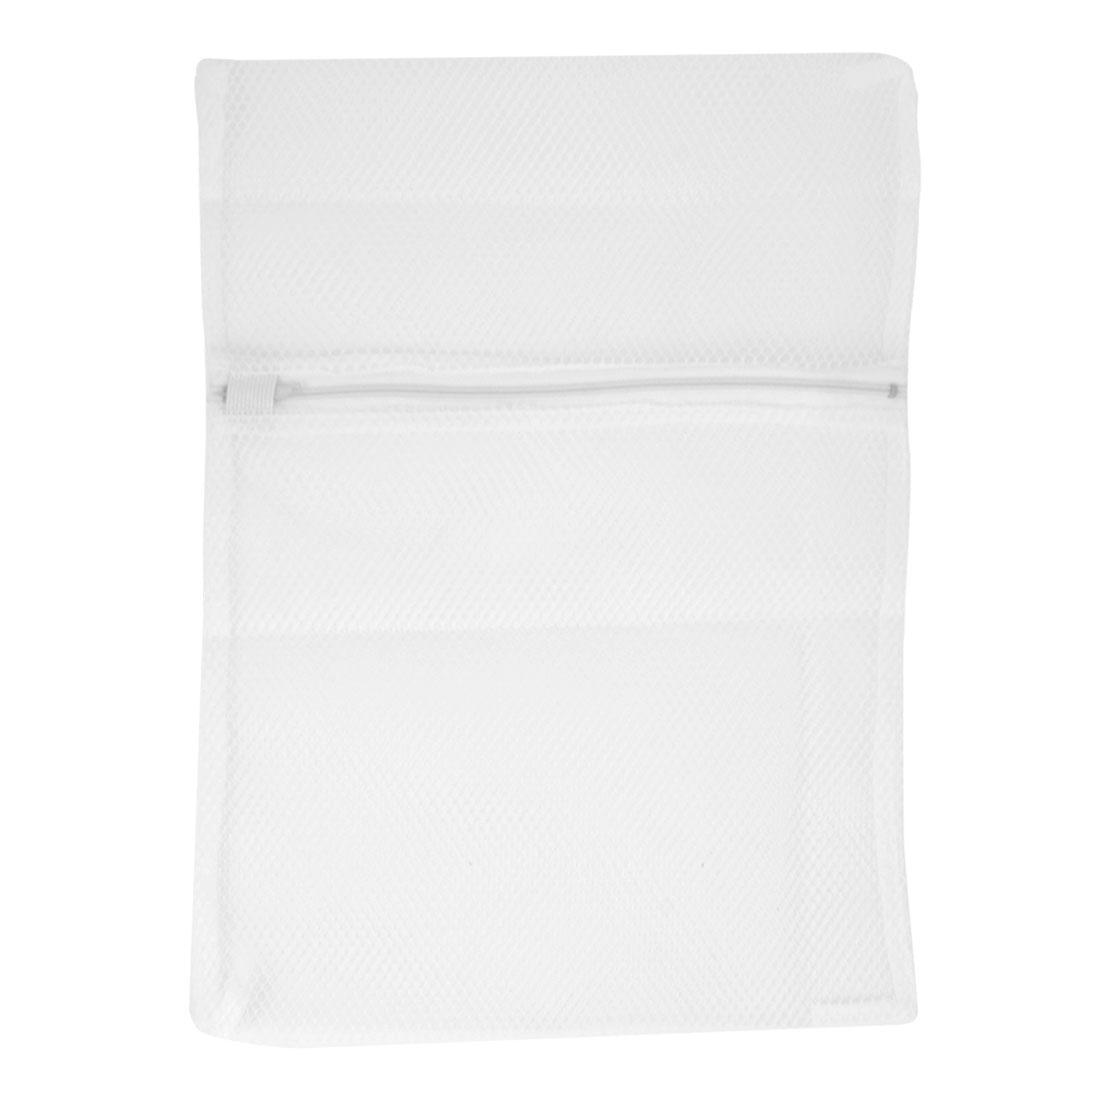 Washing Machine Zipper Closure White Nylon Mesh Clothes Socks Washing Bag 30cm x 40cm